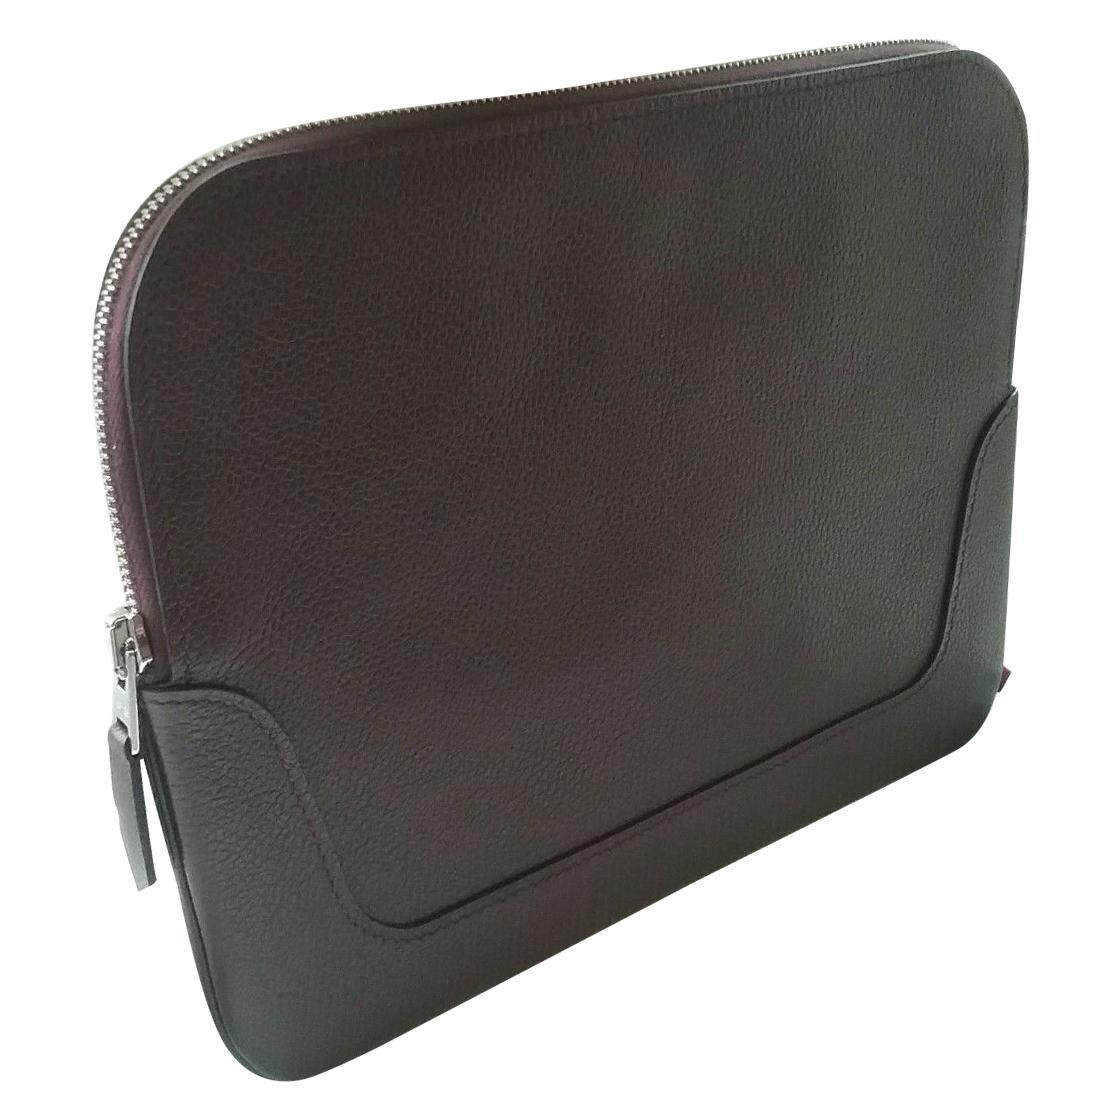 Hermes Burgundy Leather Plum Clutch Bag. Pochette